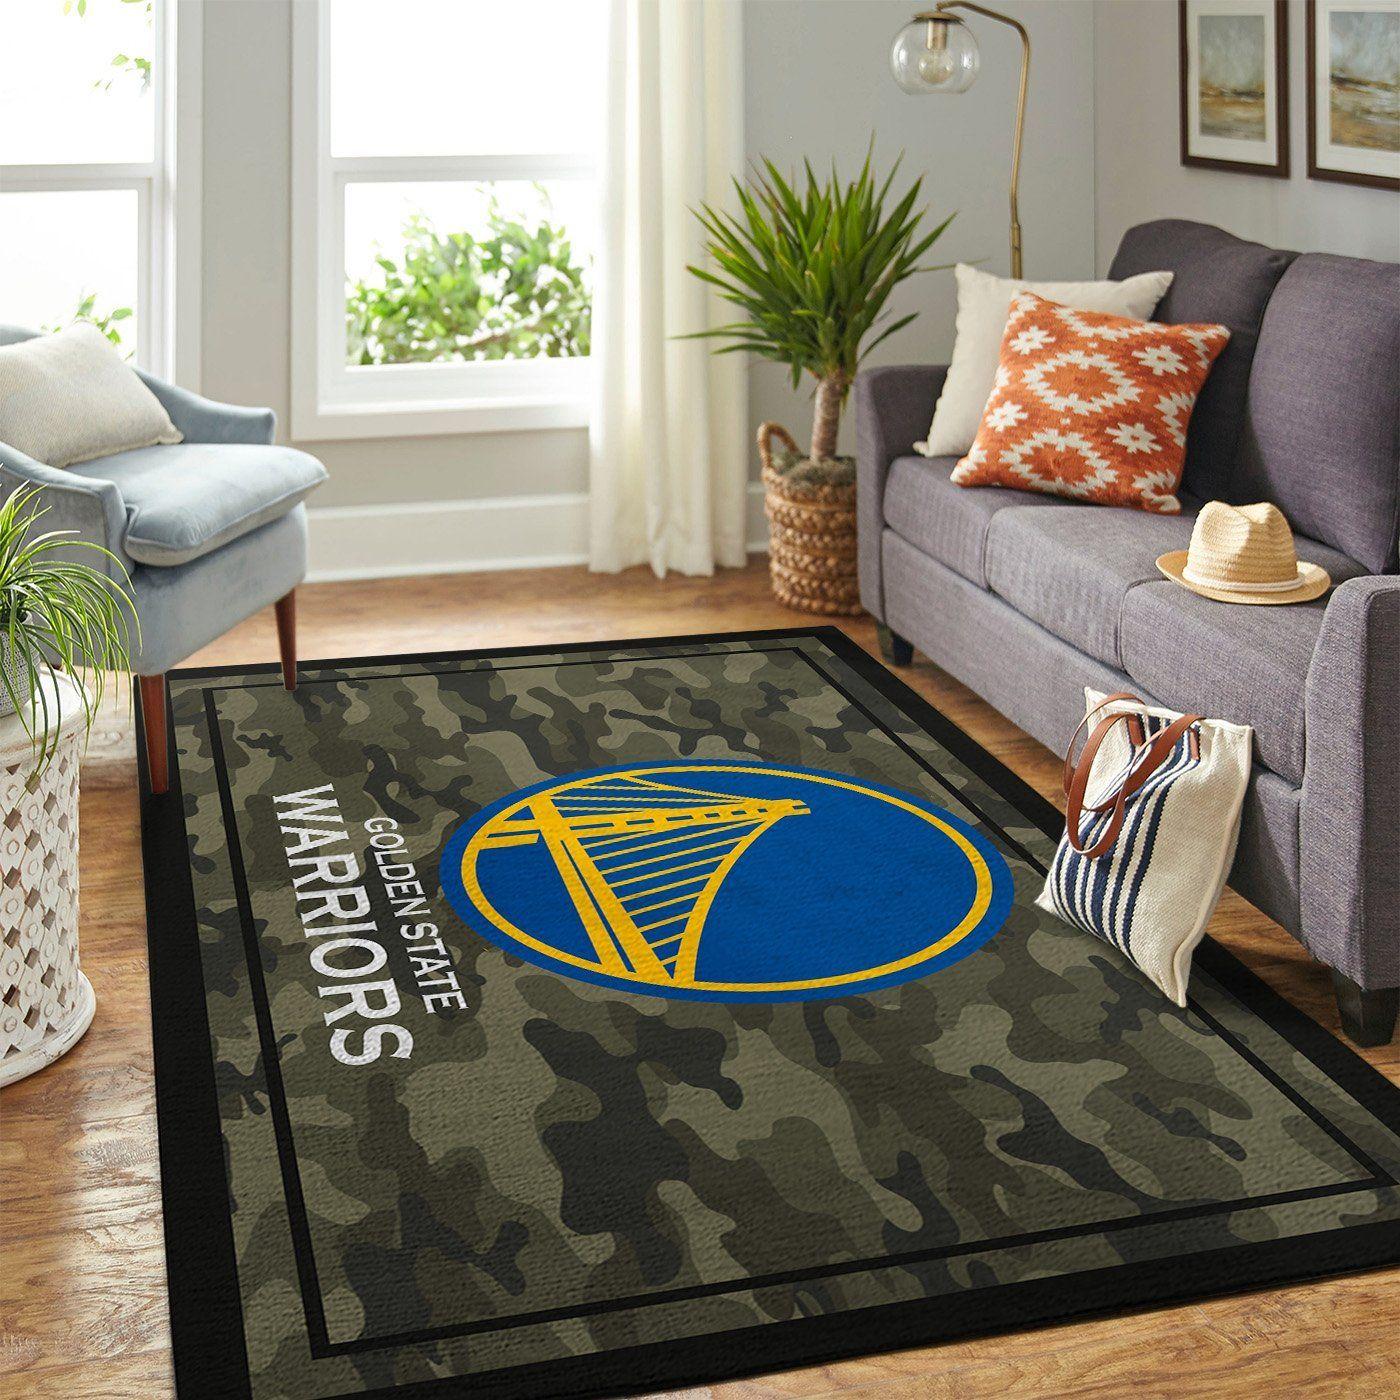 Amazon Golden State Warriors Living Room Area No3088 Rug